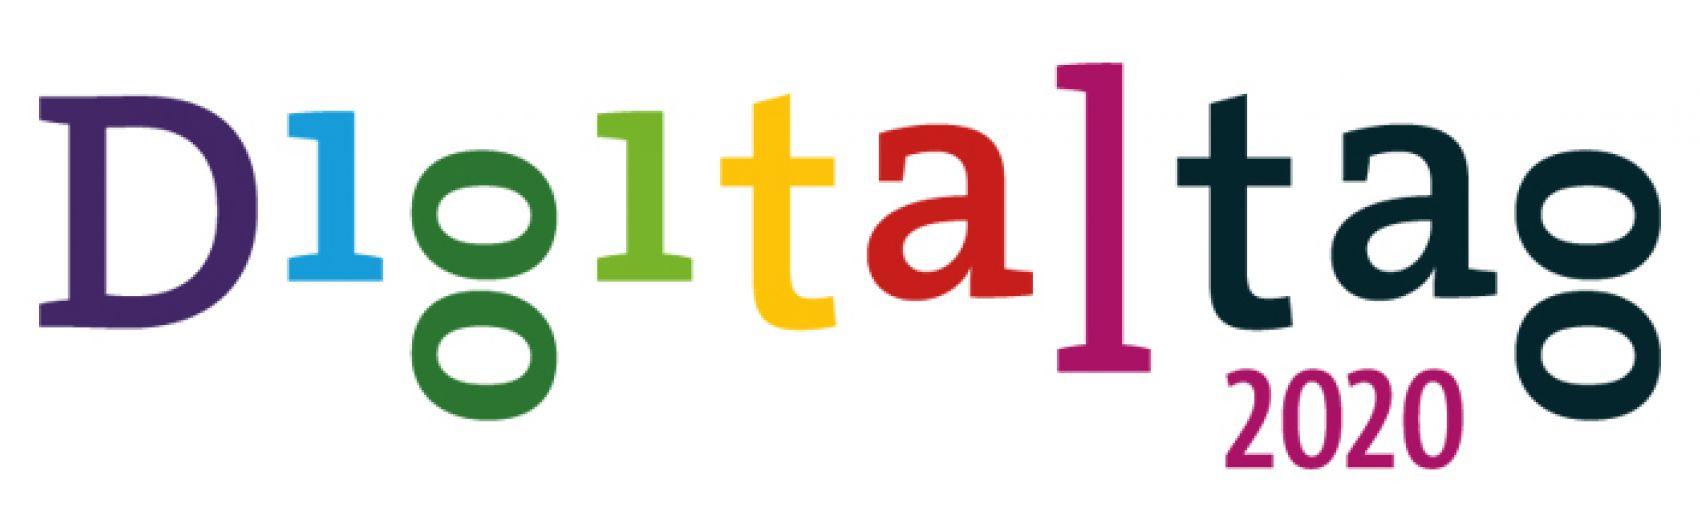 Digitaltag 2020, Logo